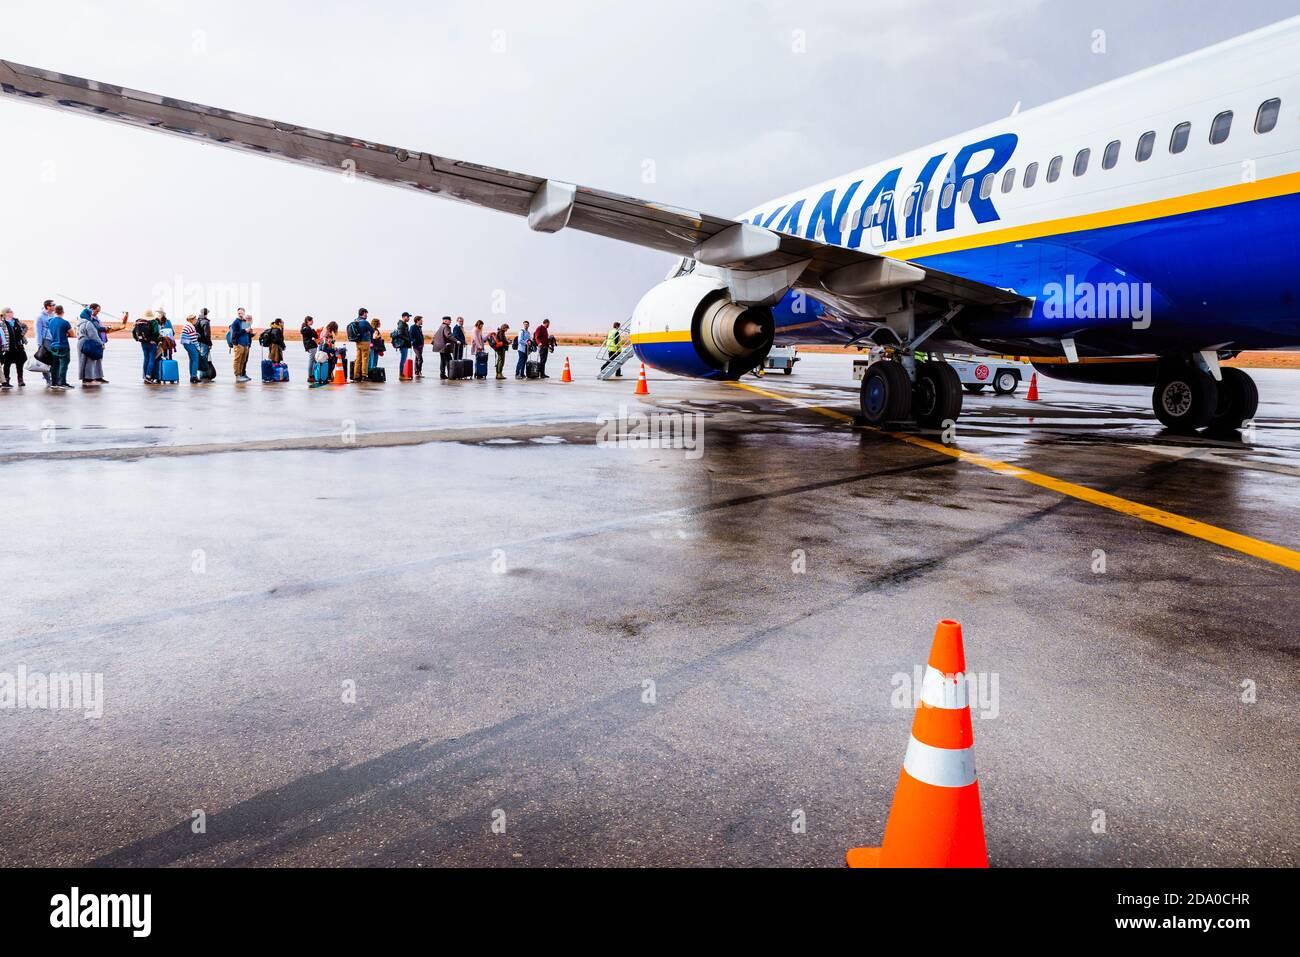 ouarzazate airport ryanair plane being boarded ouarzazate dra tafilalet morocco north africa 2DA0CHR